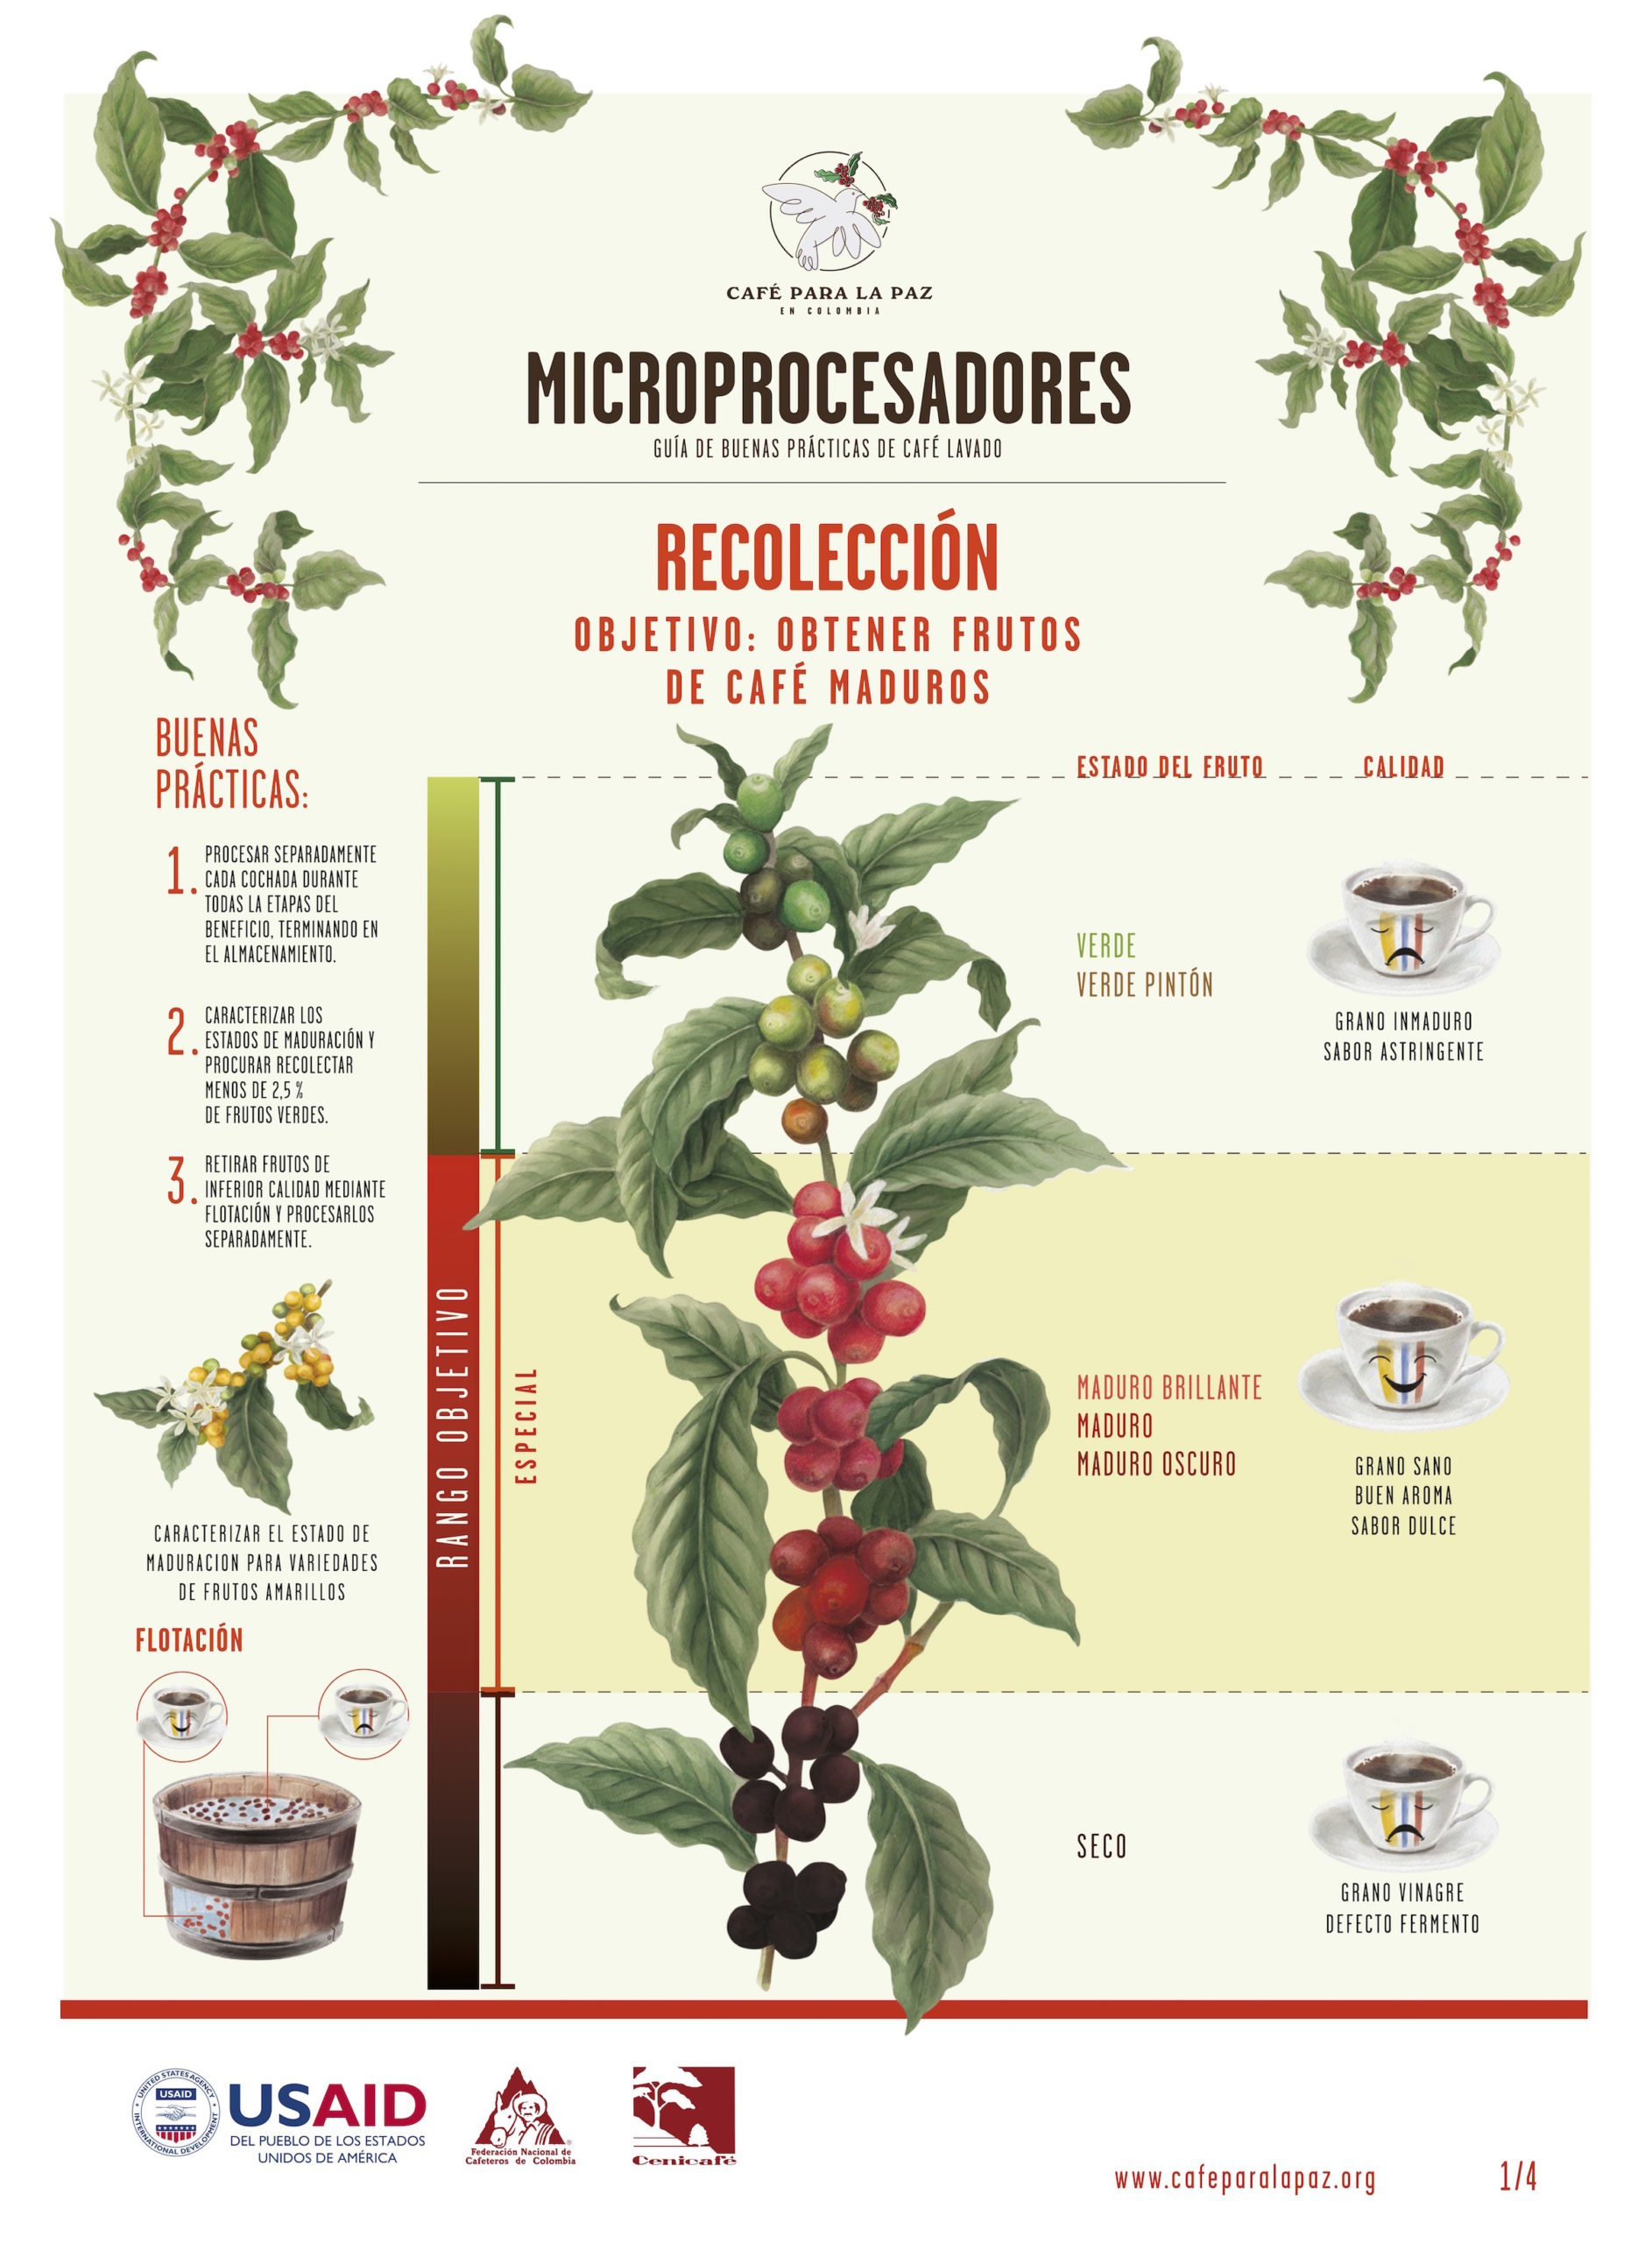 Micro-Processors 2.0 poster